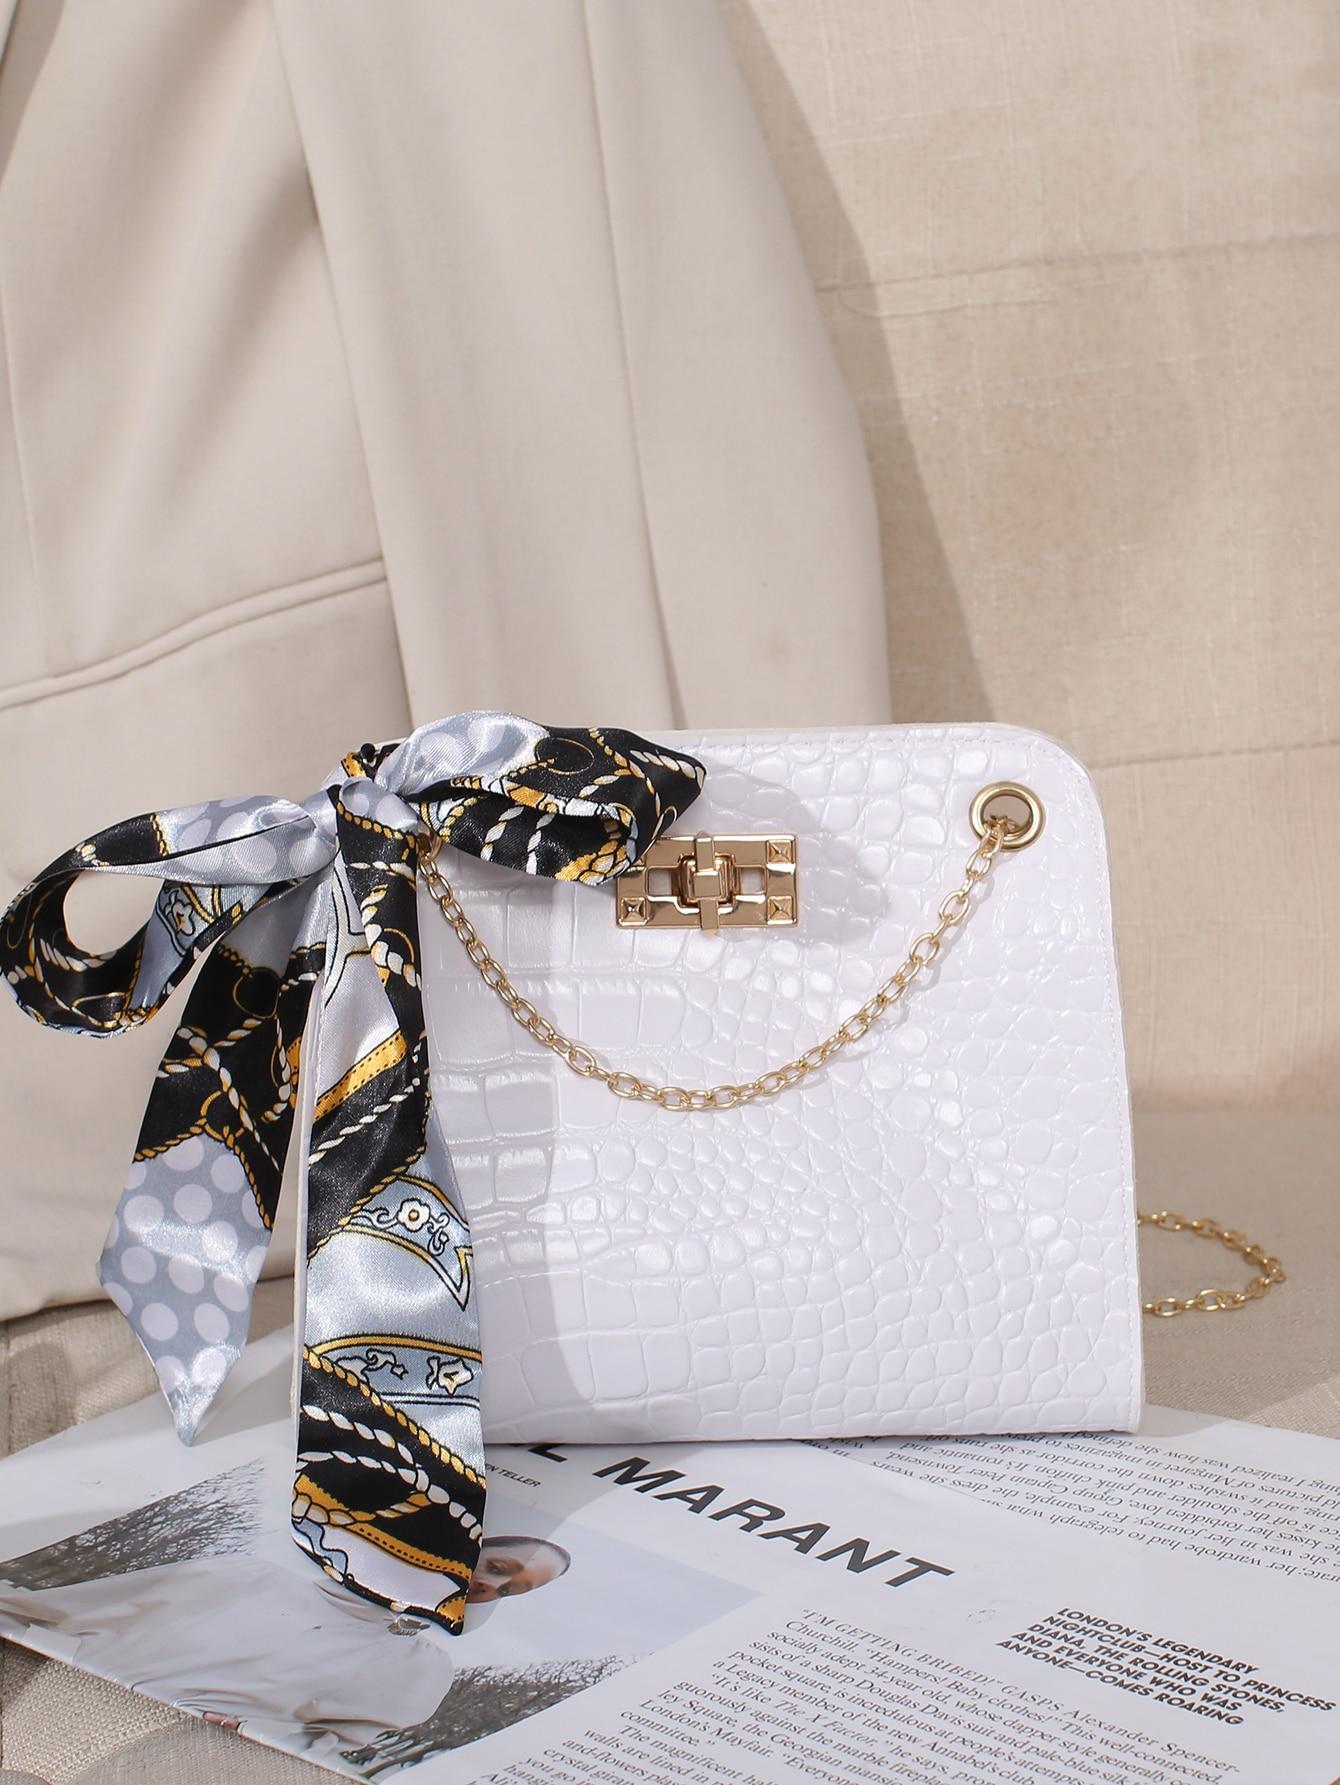 Scarf Bow Decor Croc Embossed Chain Shoulder Bag